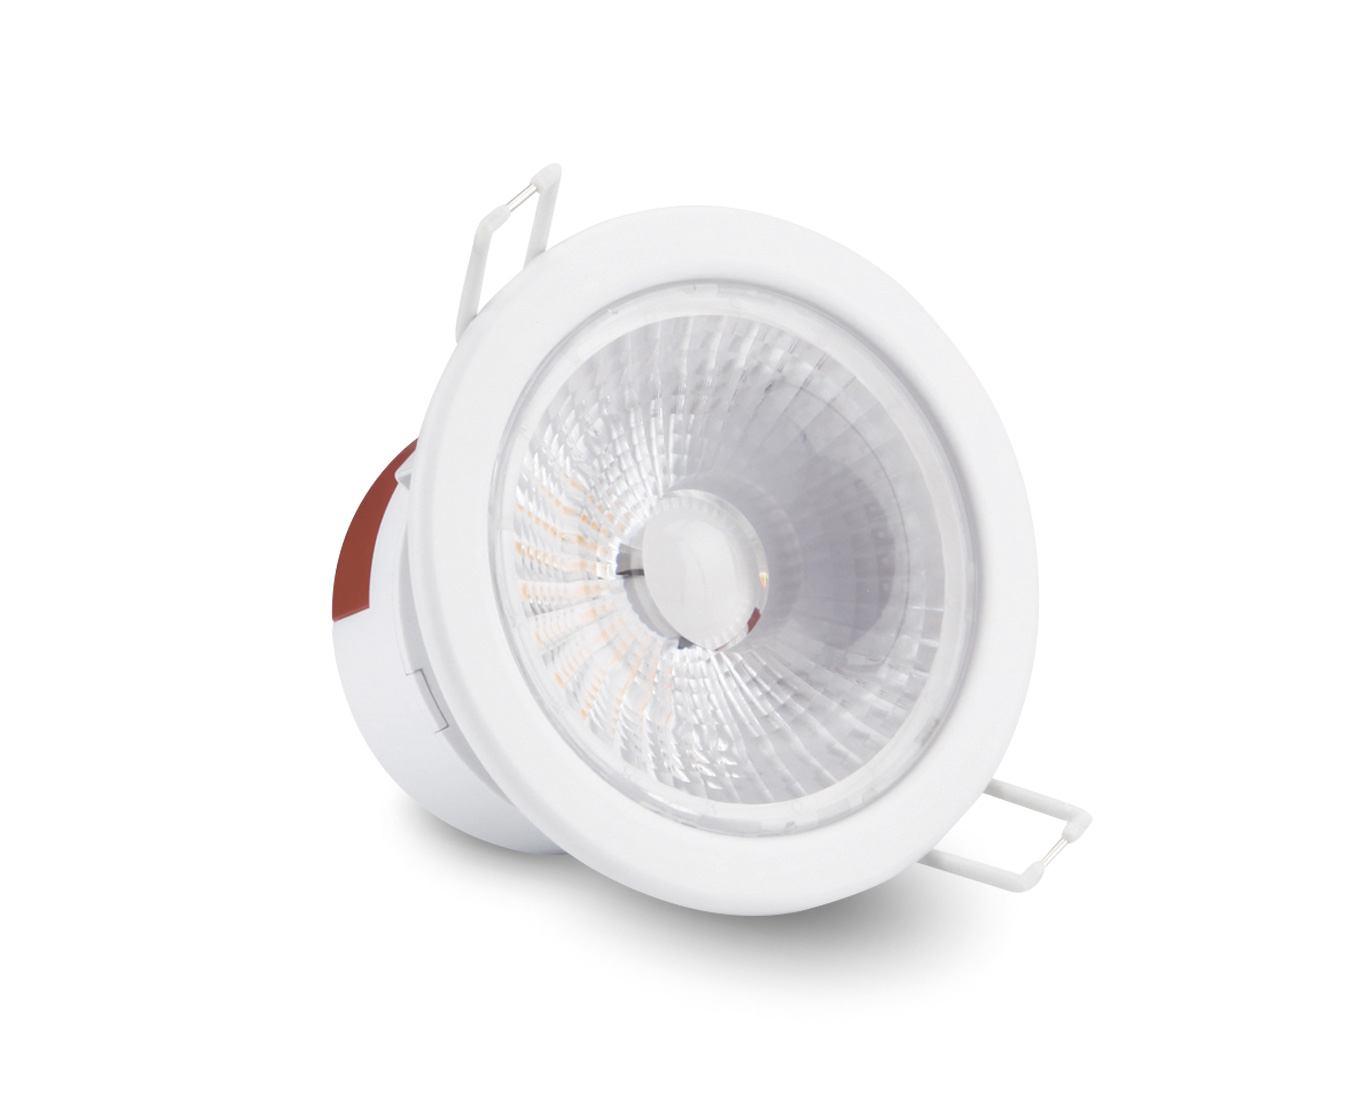 LG D1030RW2T3A - LG D1030RW2T3A Indoor Suitable for indoor use ...